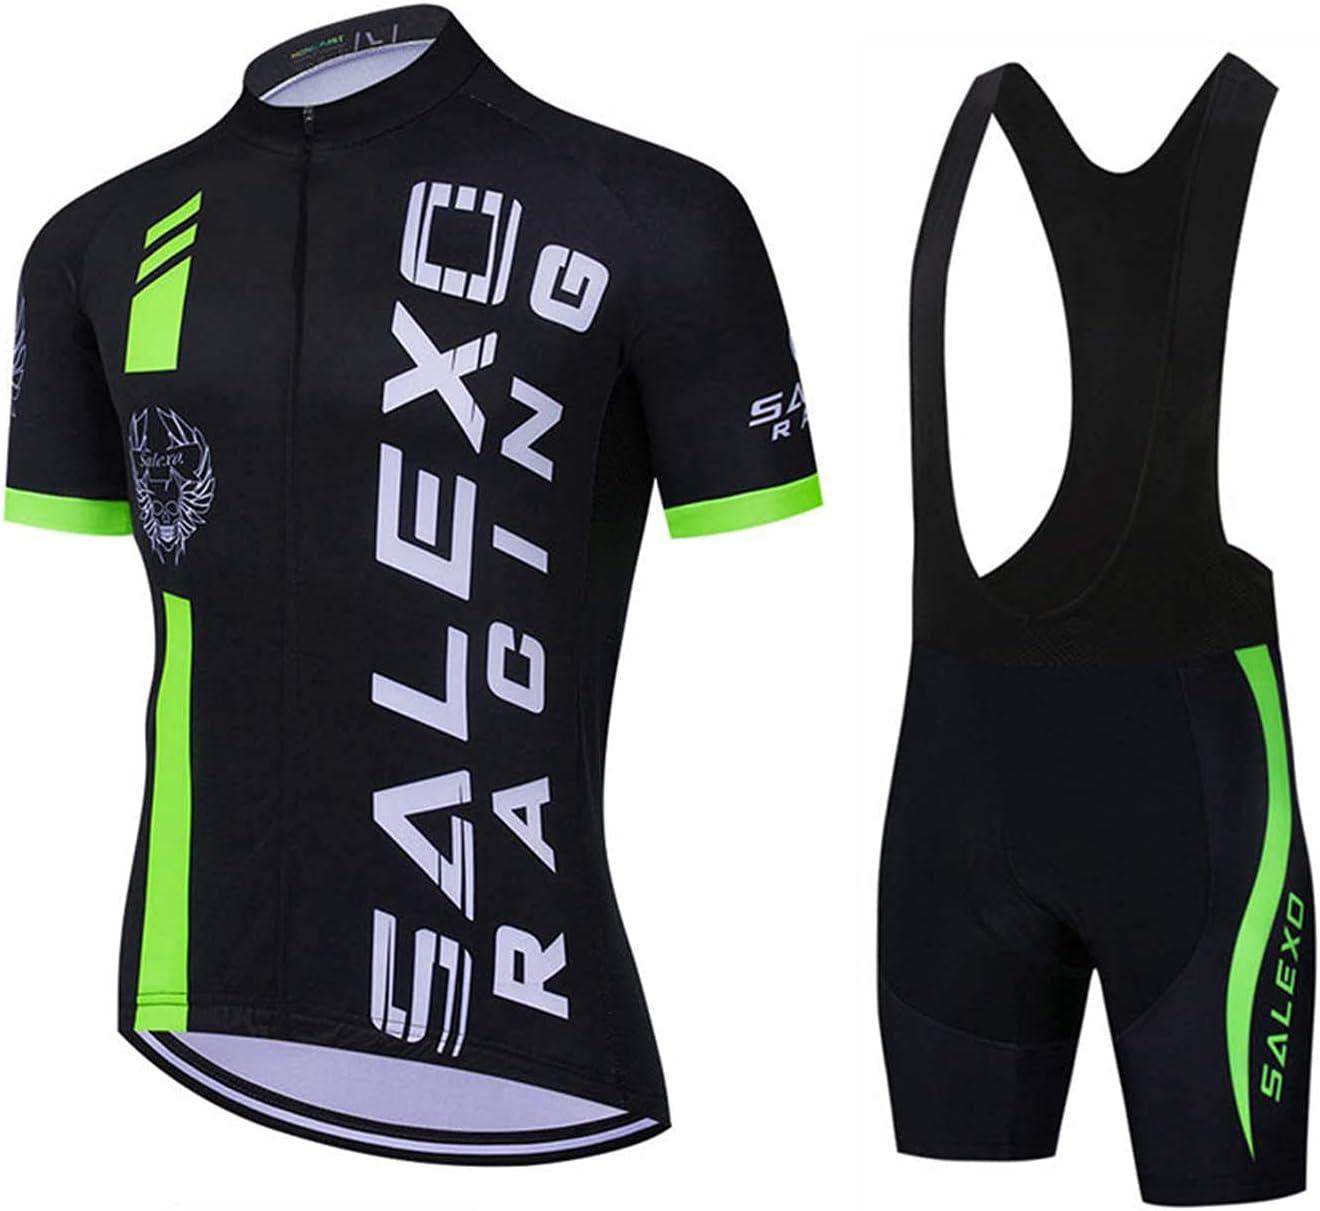 CCCYT Max 76% Ranking TOP11 OFF Bicycle Short Sleeve Set Road + Sh Bib Bike Shirt